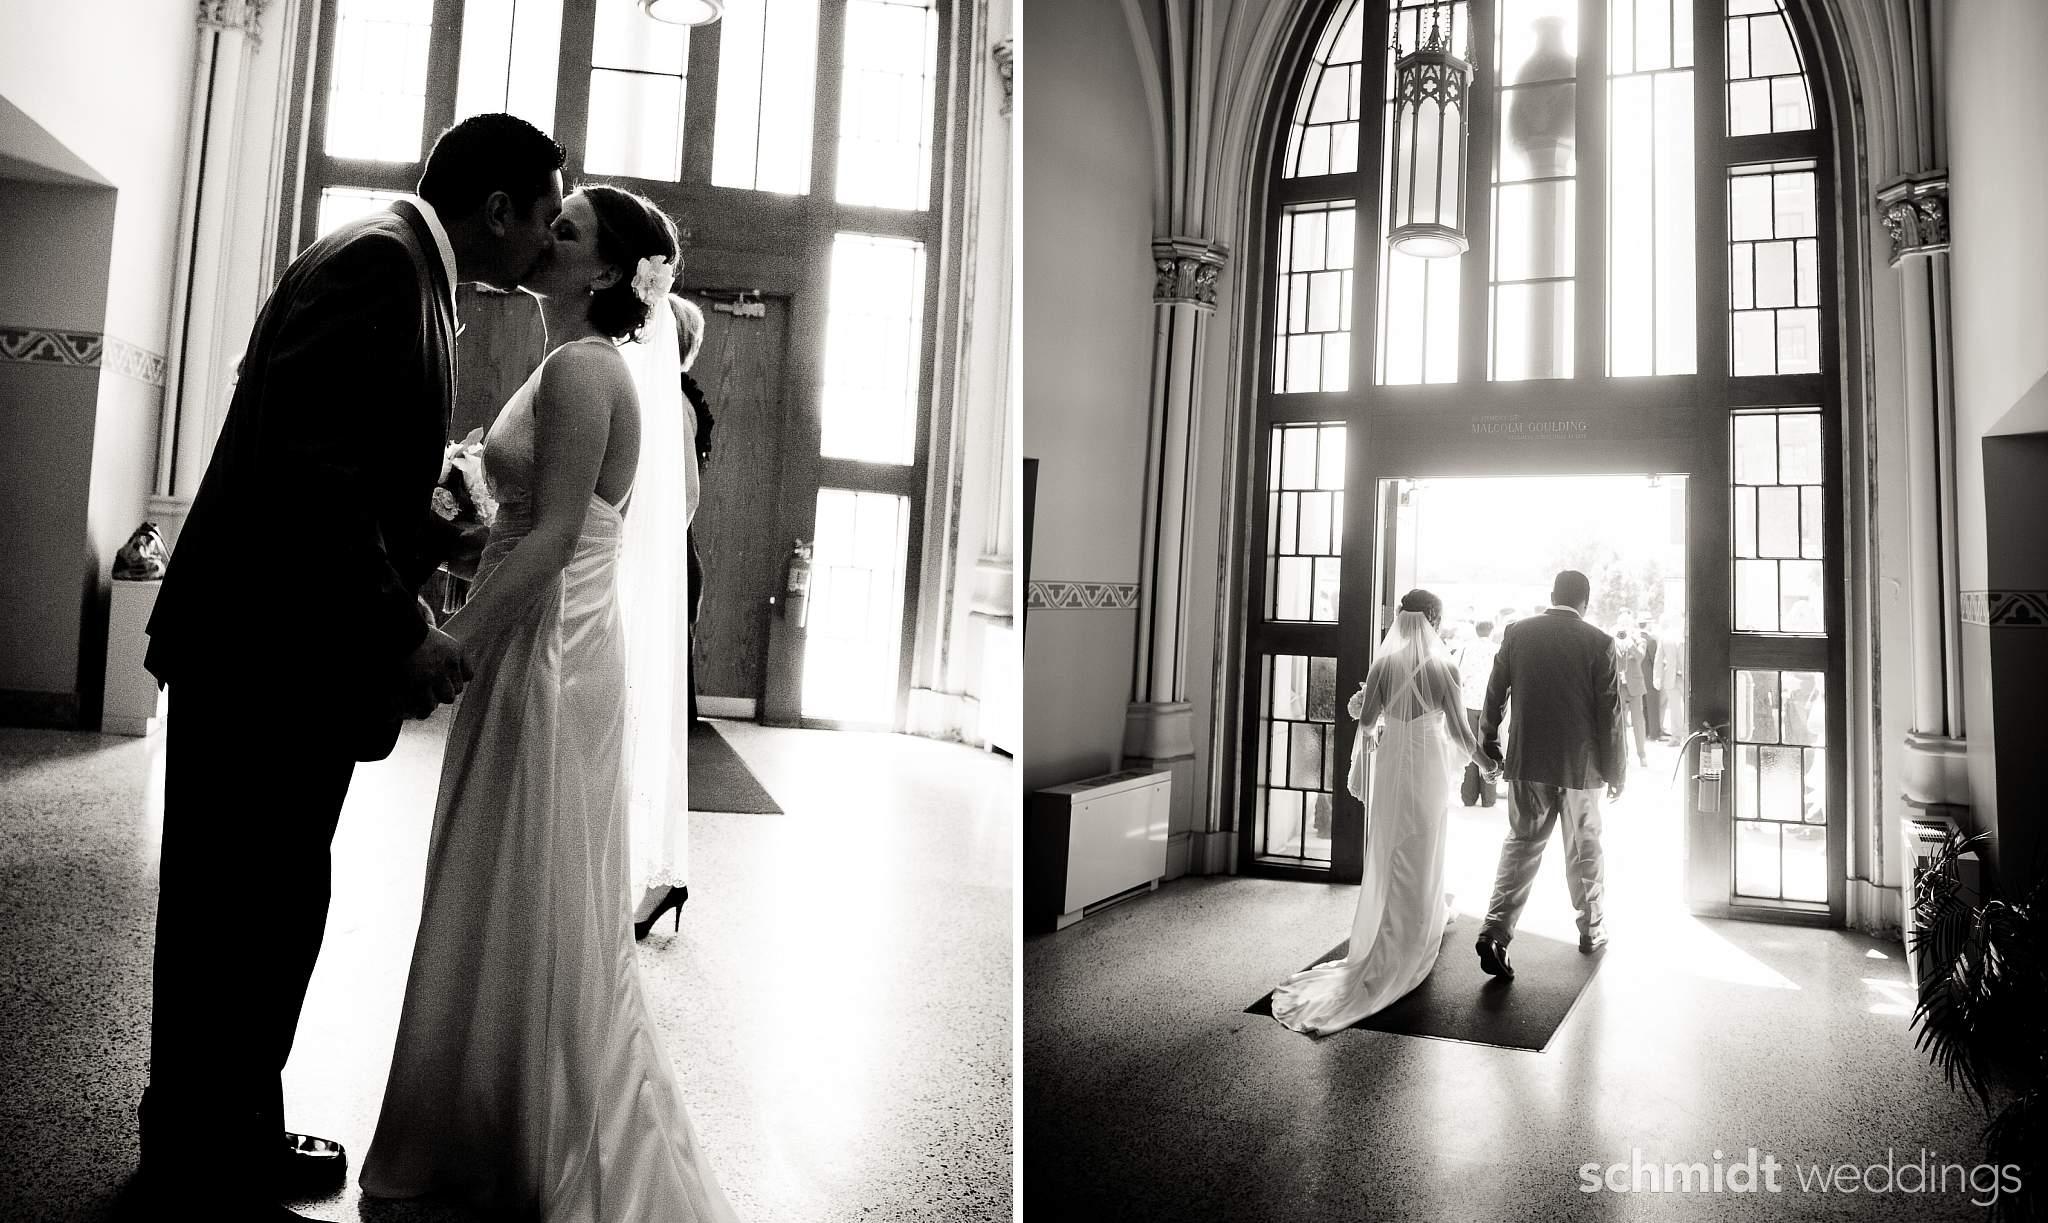 Artistic beautiful wedding pictures Chicago Schmidt Photo